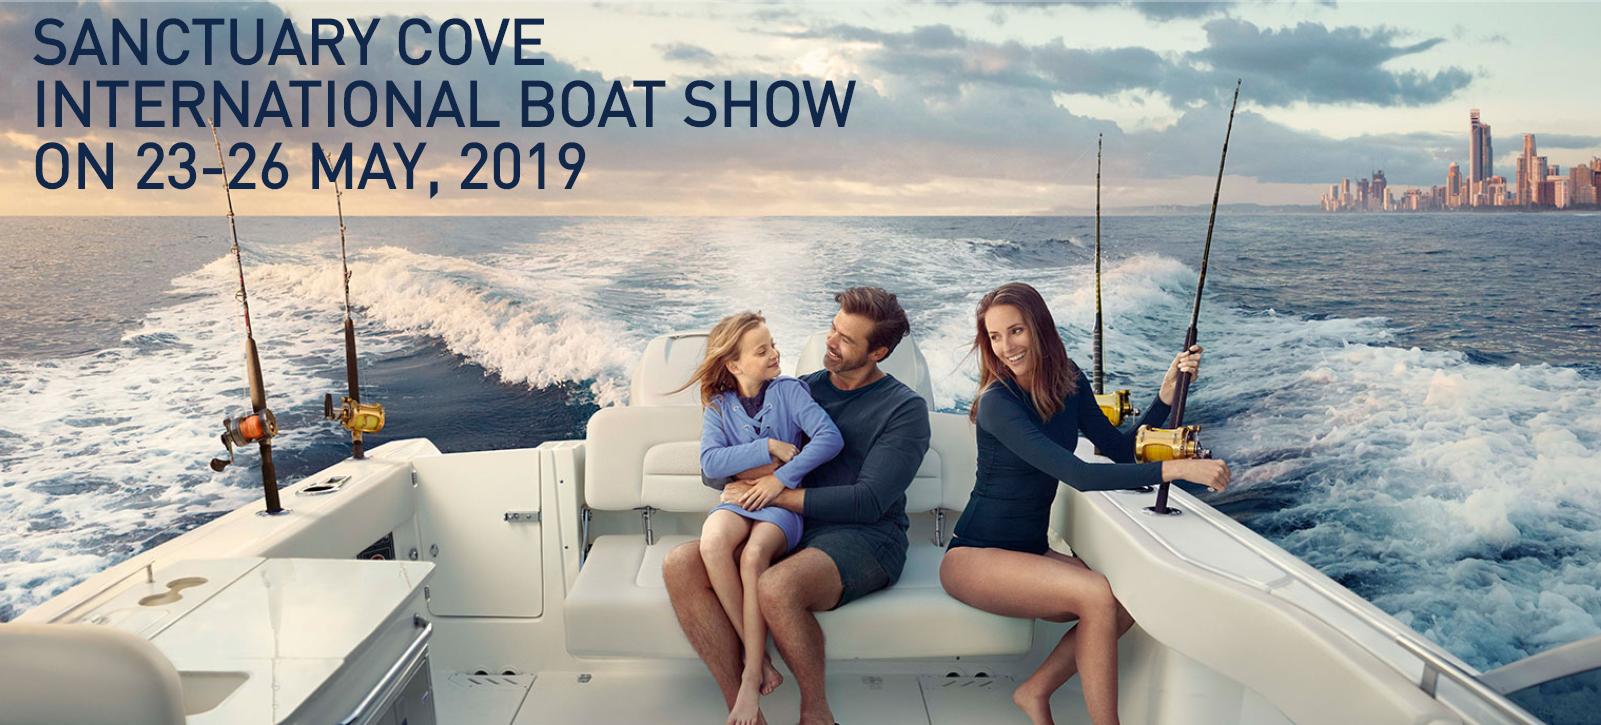 Sanctuary Cove Boat Show 2019